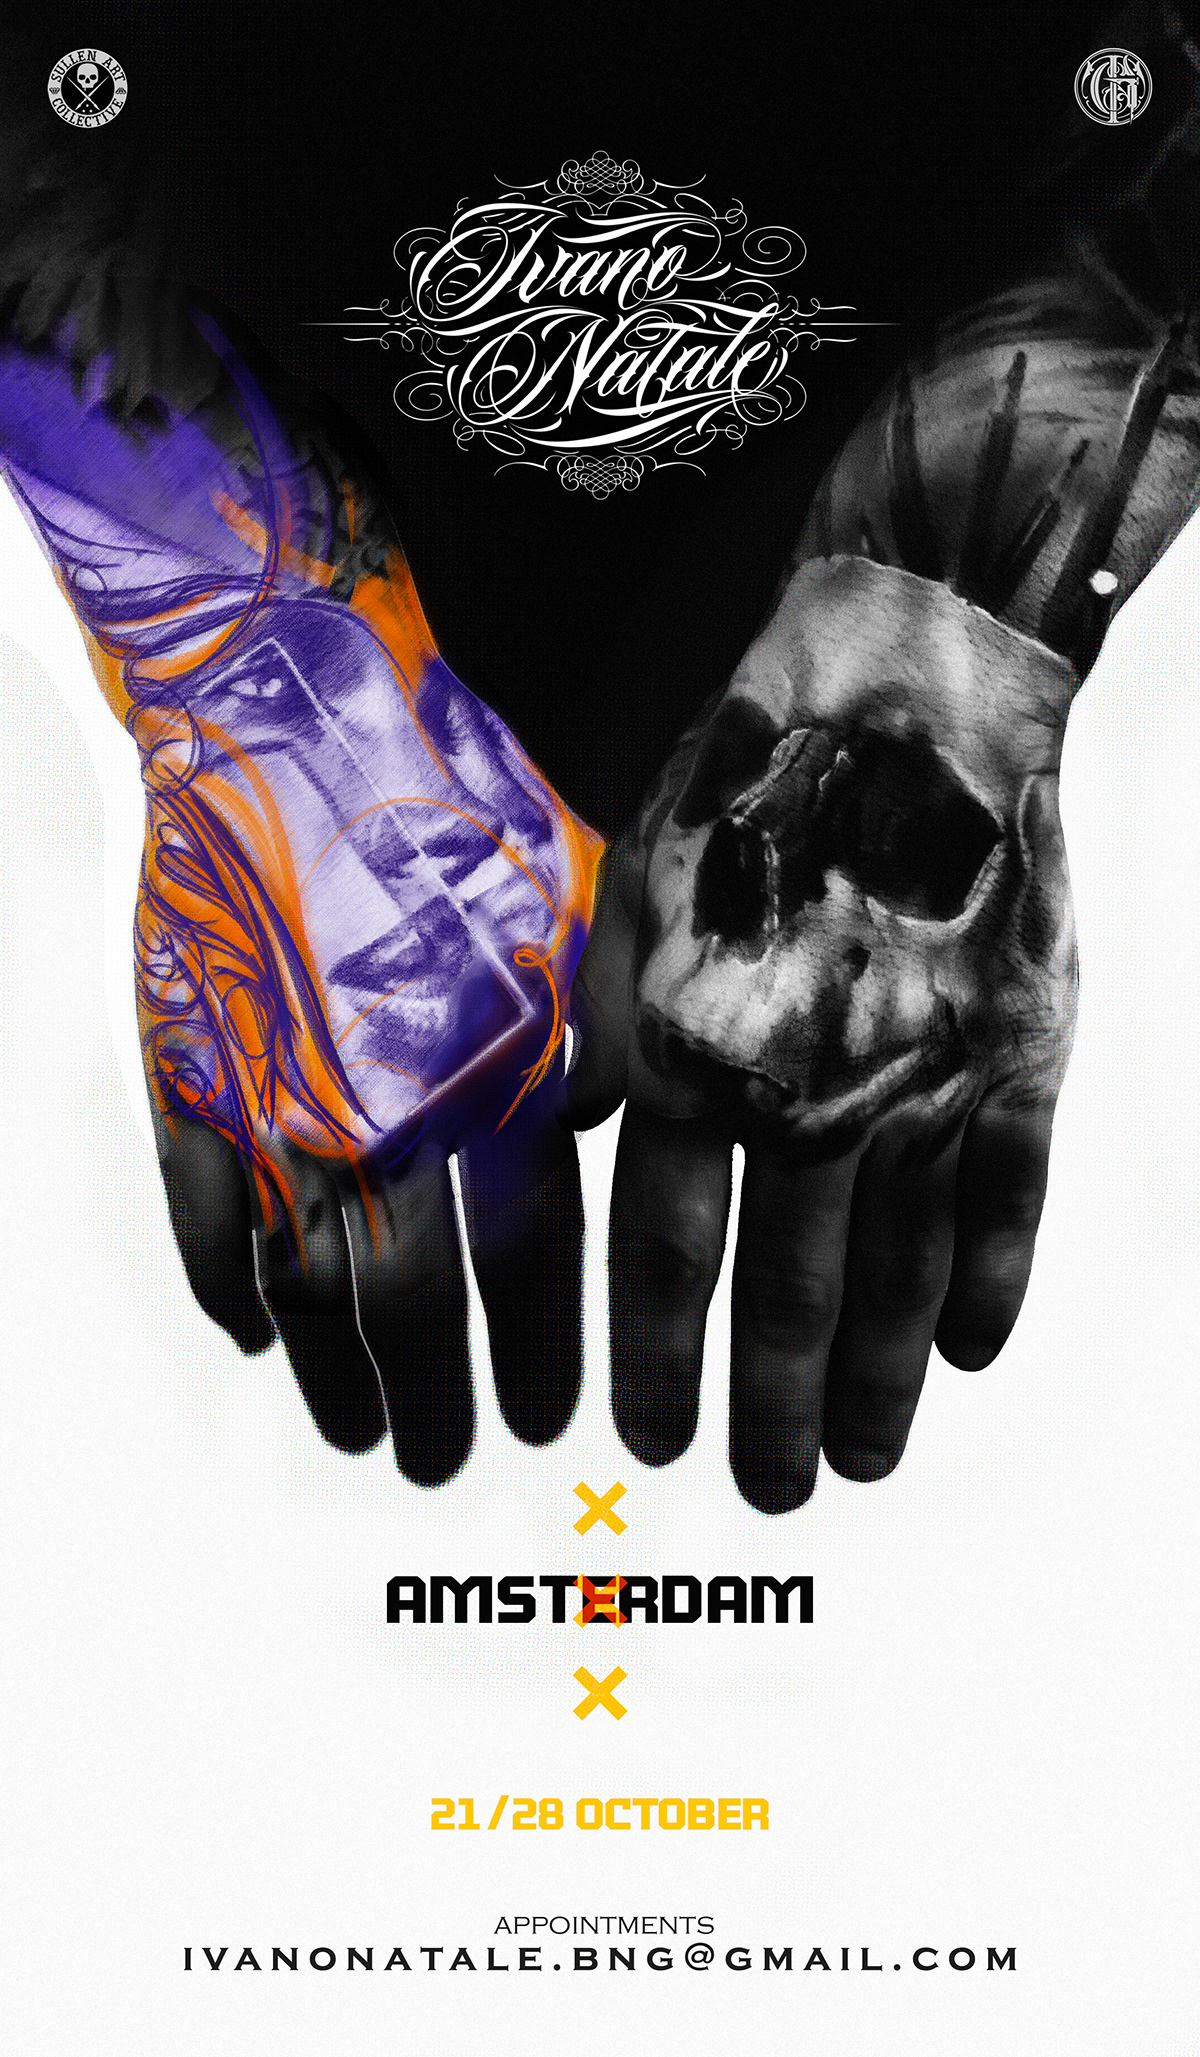 art artist creativediresction design Events graphicdesign imageconsulting poster tattooartist visualart